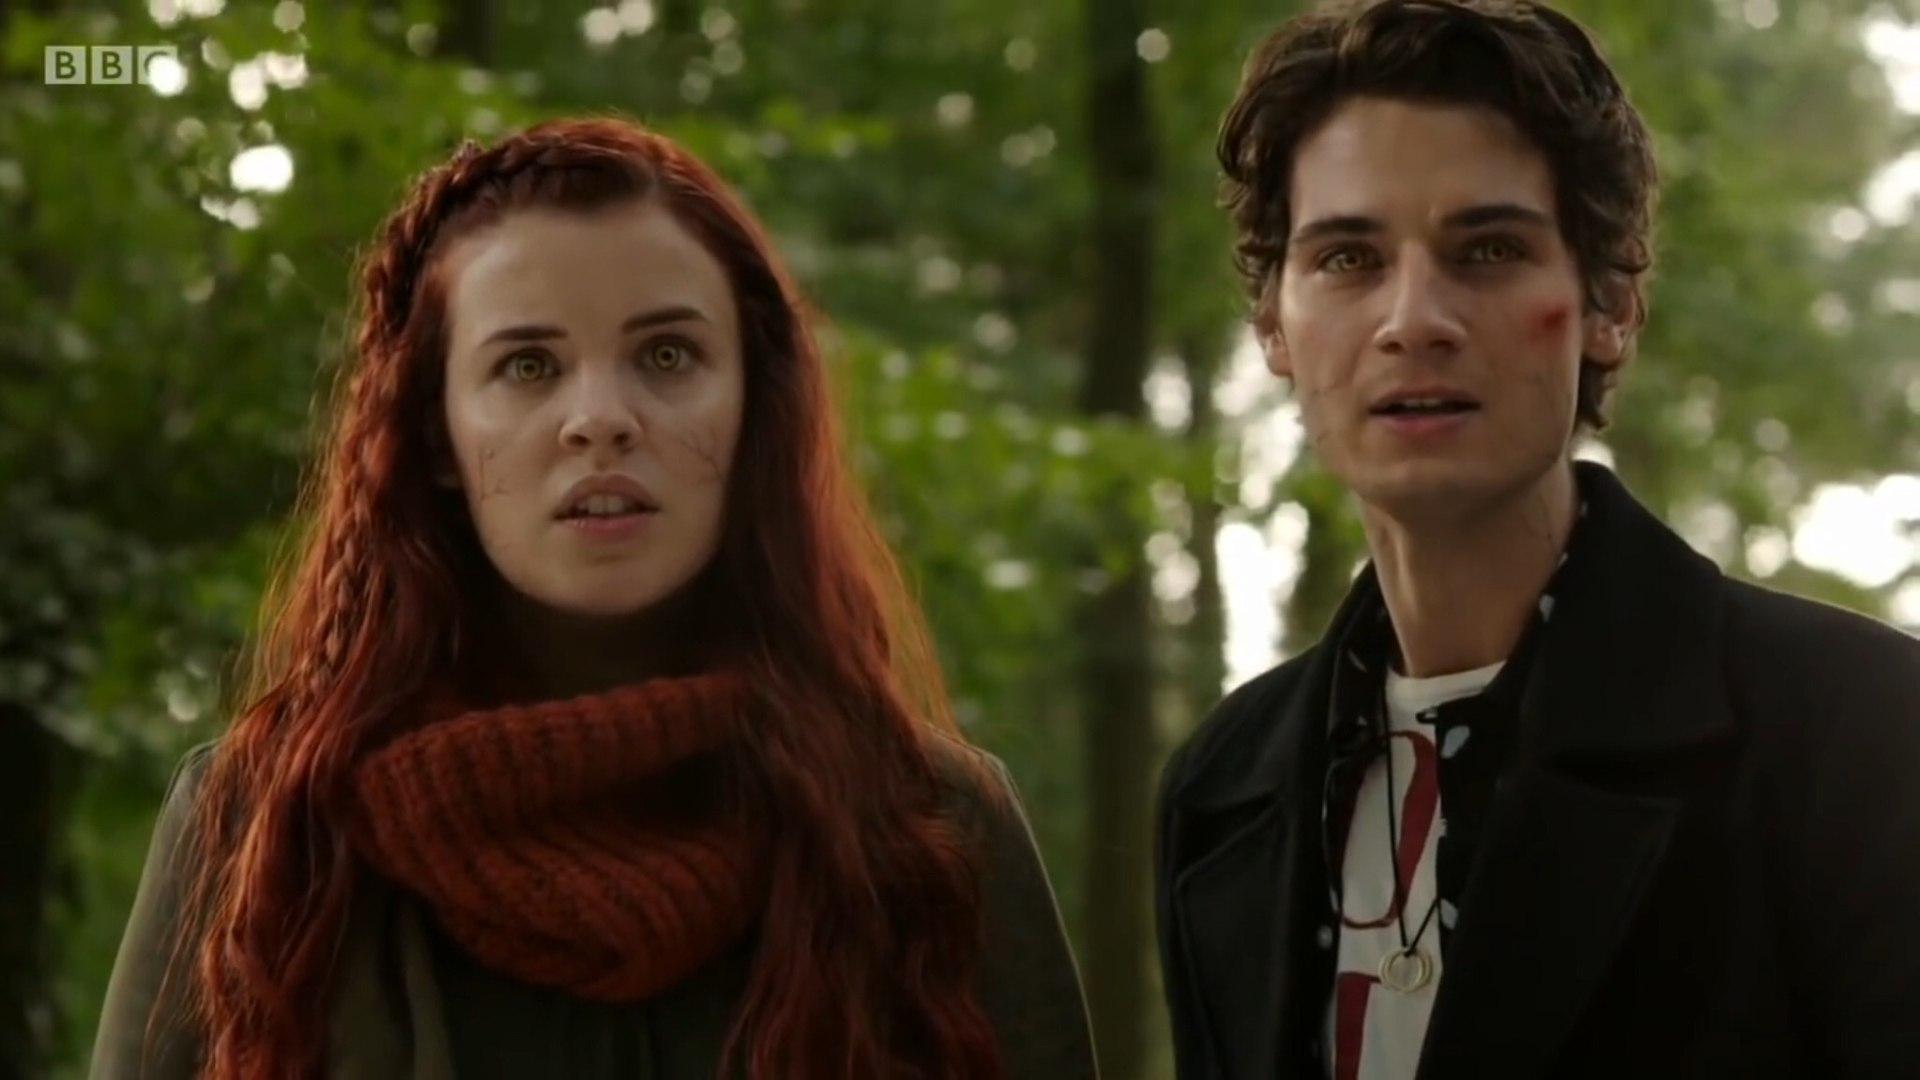 Wolfblood - Season 5 Episode 1 - Brave New World